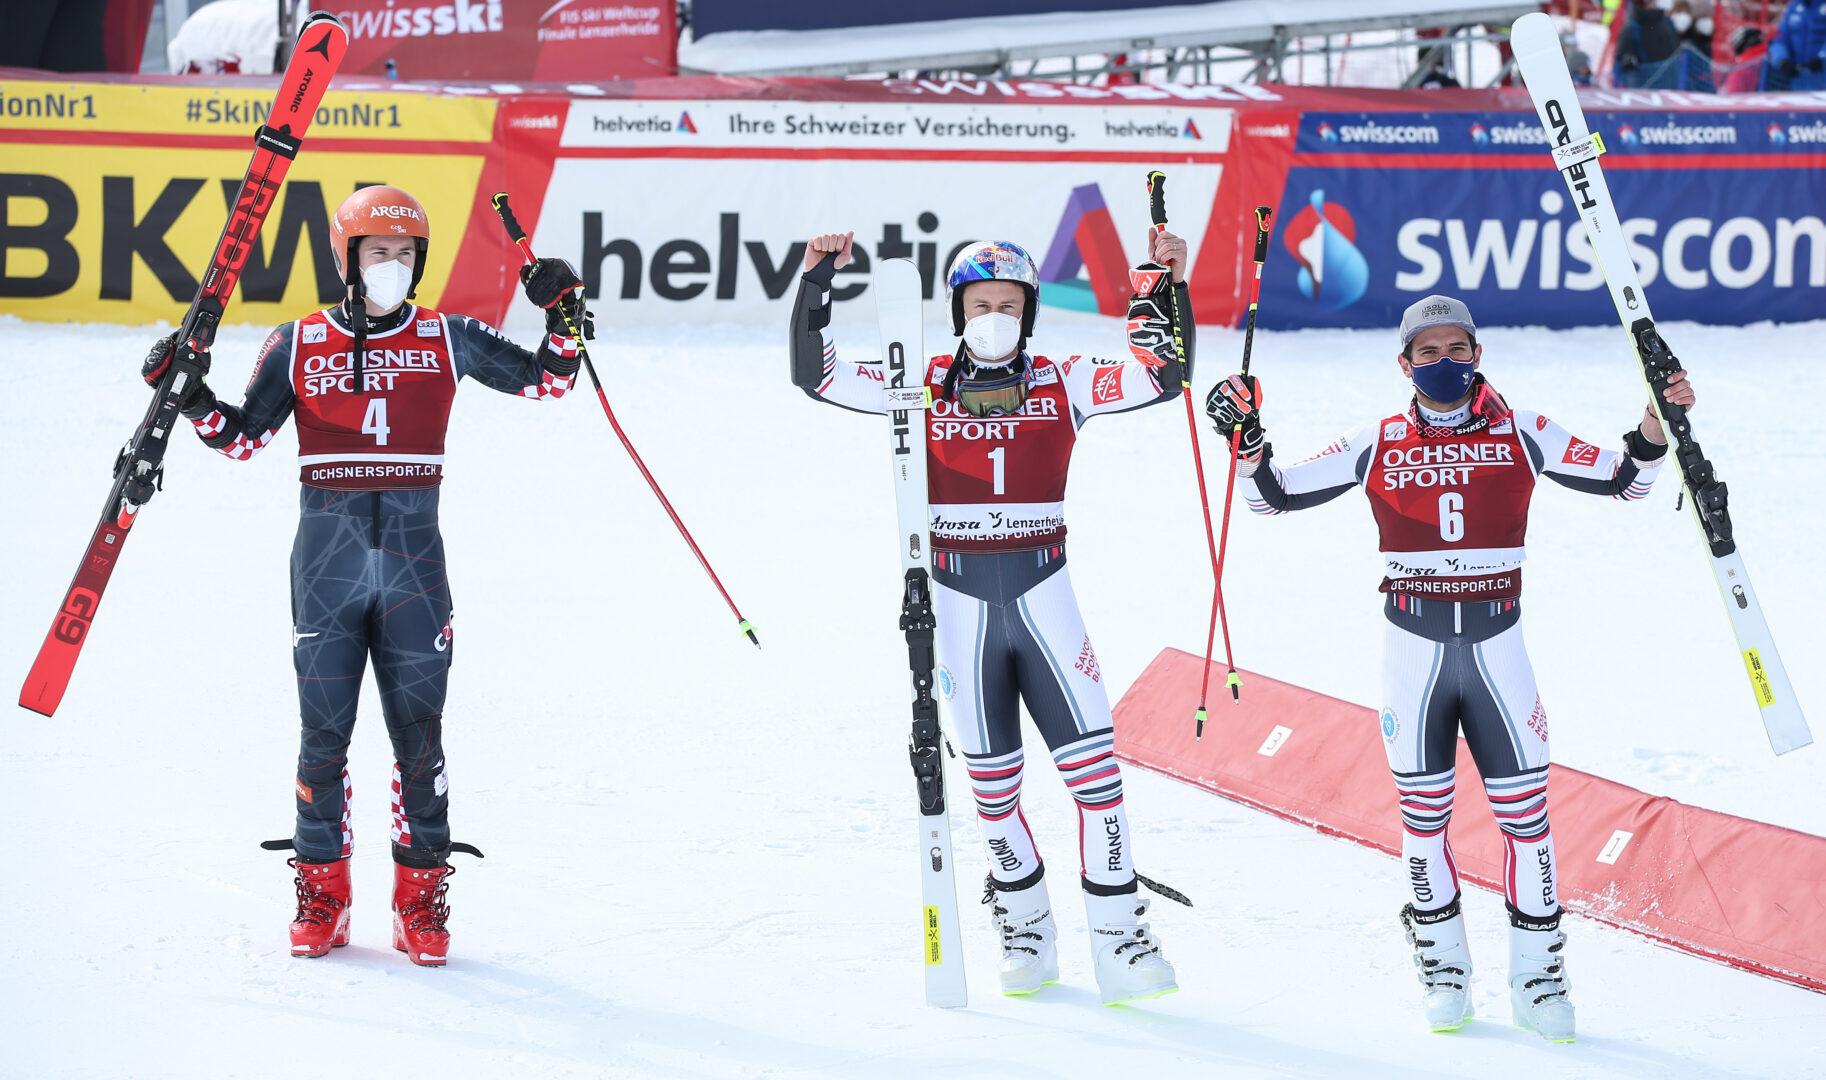 podium ski alpin alexis pinturault  filip zubcic mathieu faivre